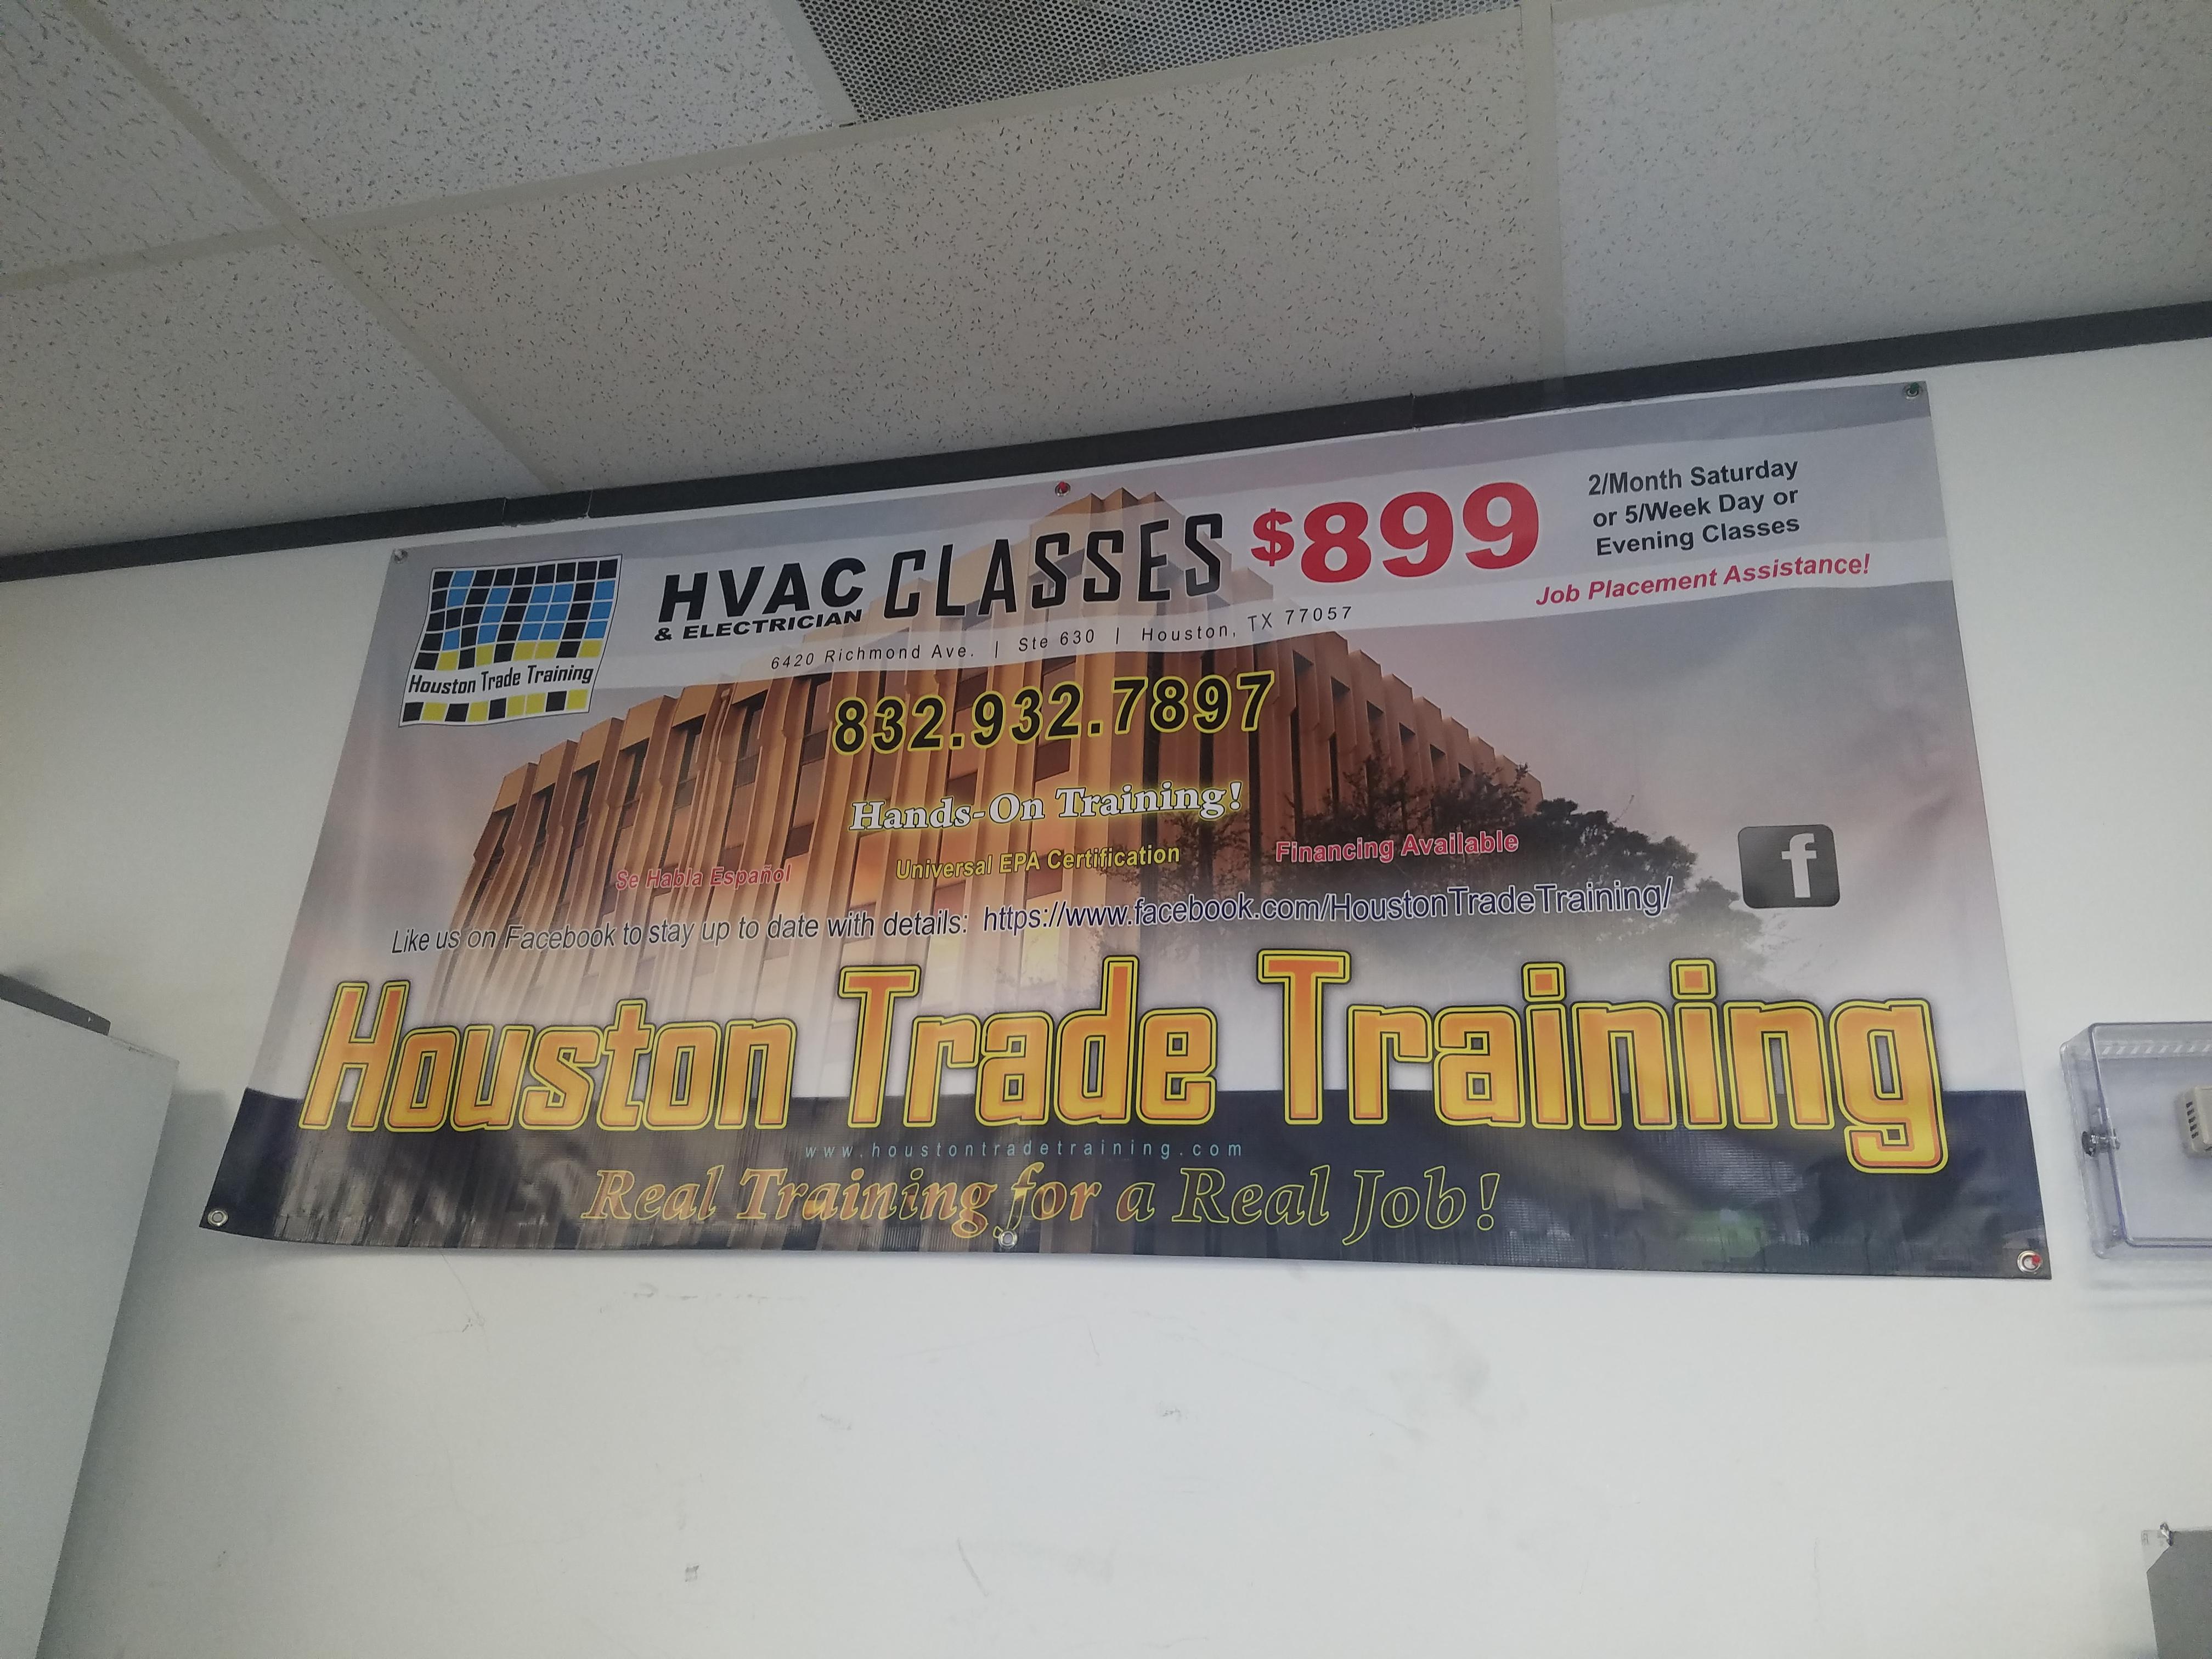 Houston trade training 6100 richmond ave ste 214 houston tx houston trade training 6100 richmond ave ste 214 houston tx 77057 yp xflitez Images